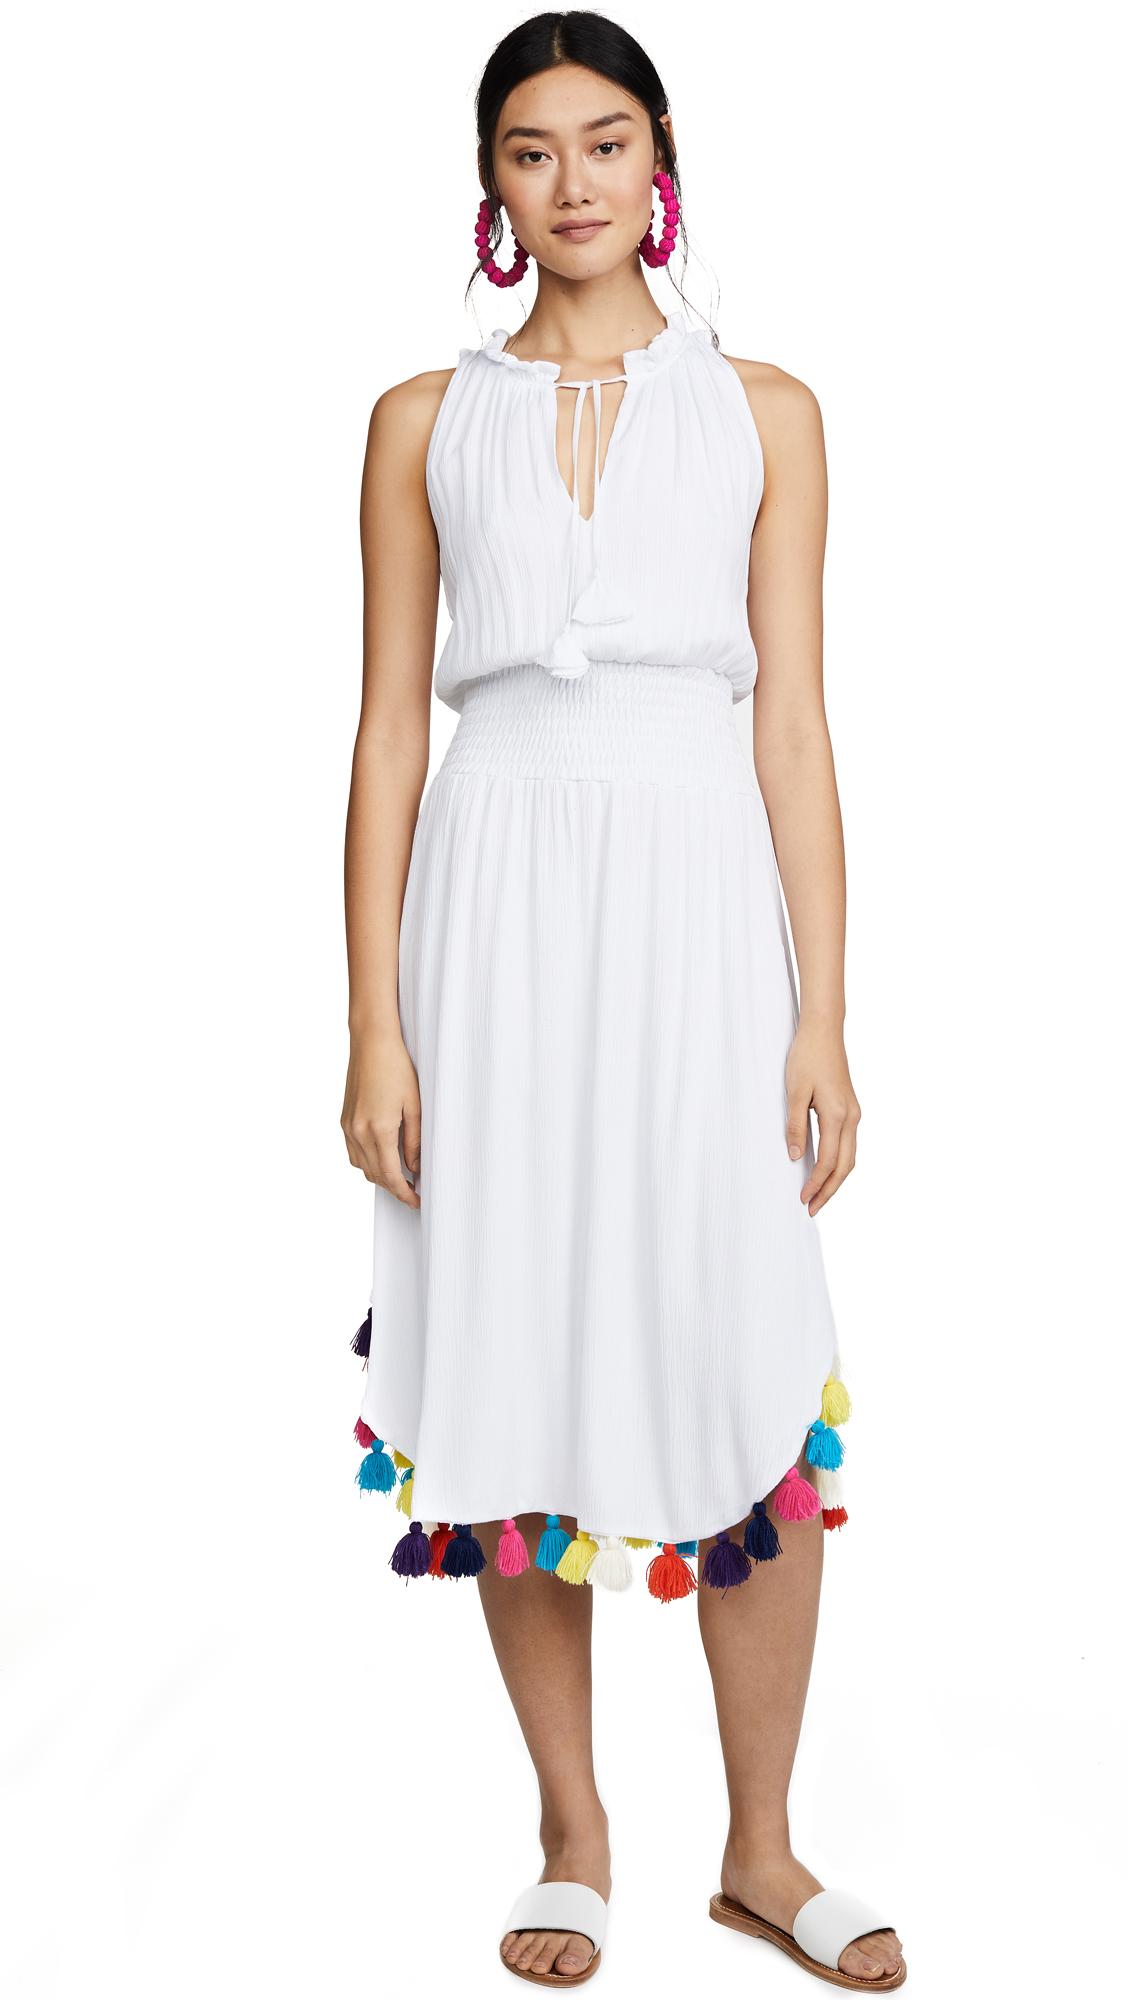 MISA Athena Dress with Rainbow Tassels